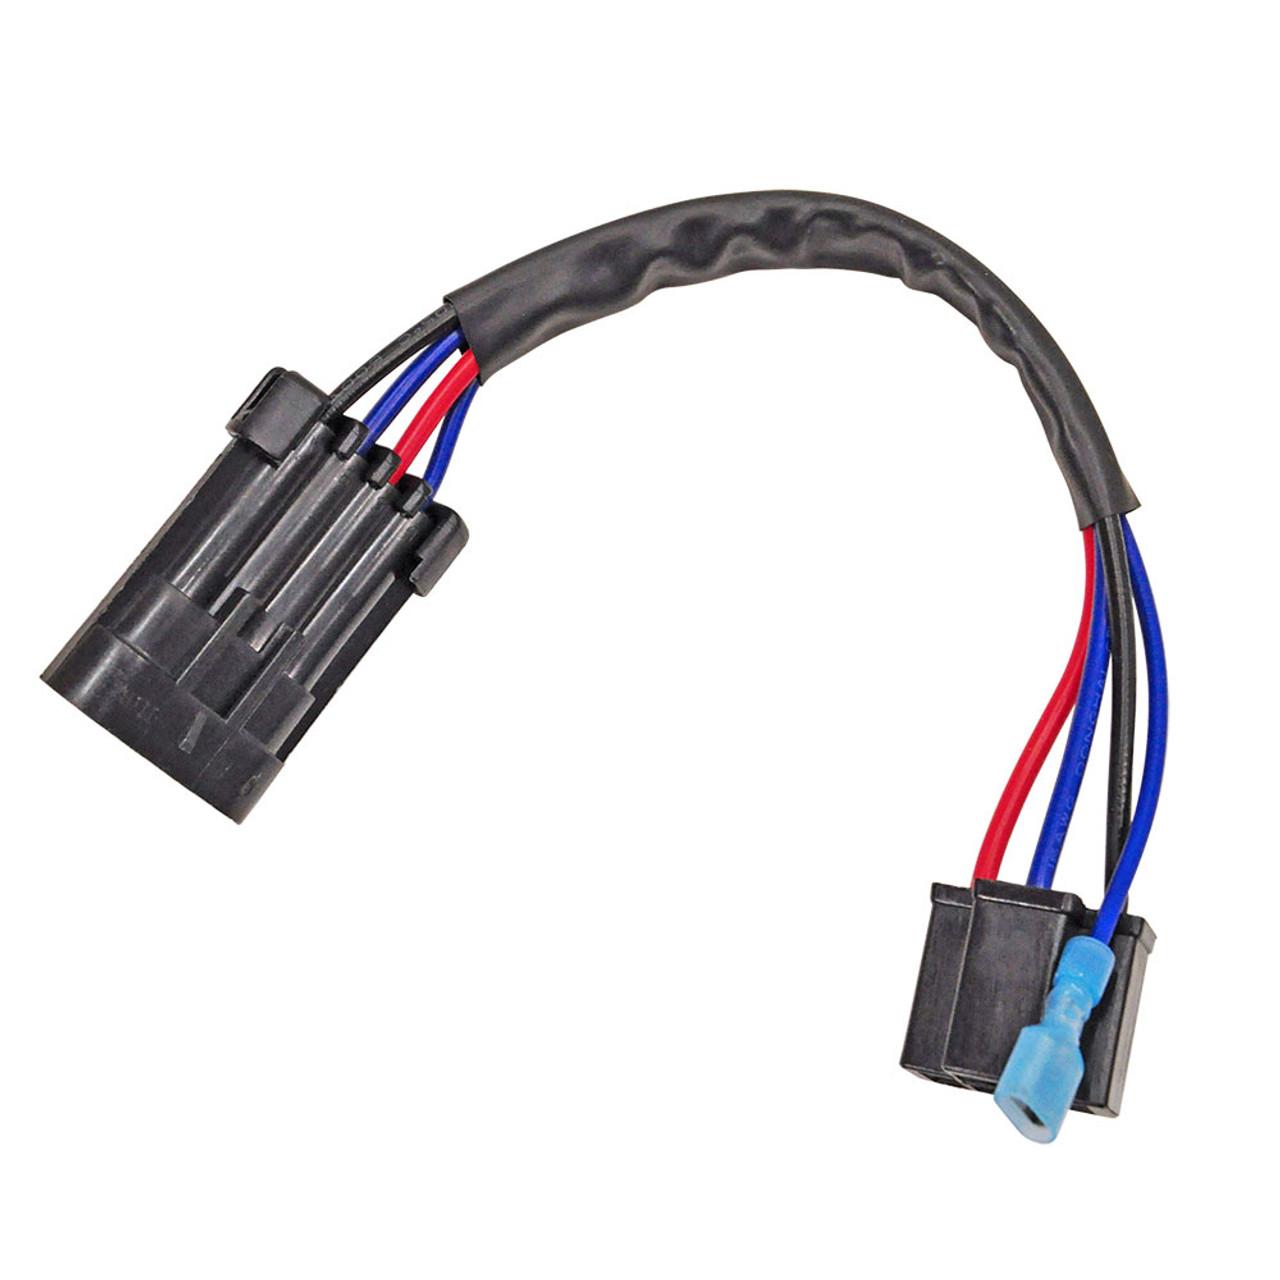 hight resolution of custom dynamics led head lamp adaptor 1 33738 1554396576 jpg c 2 imbypass on